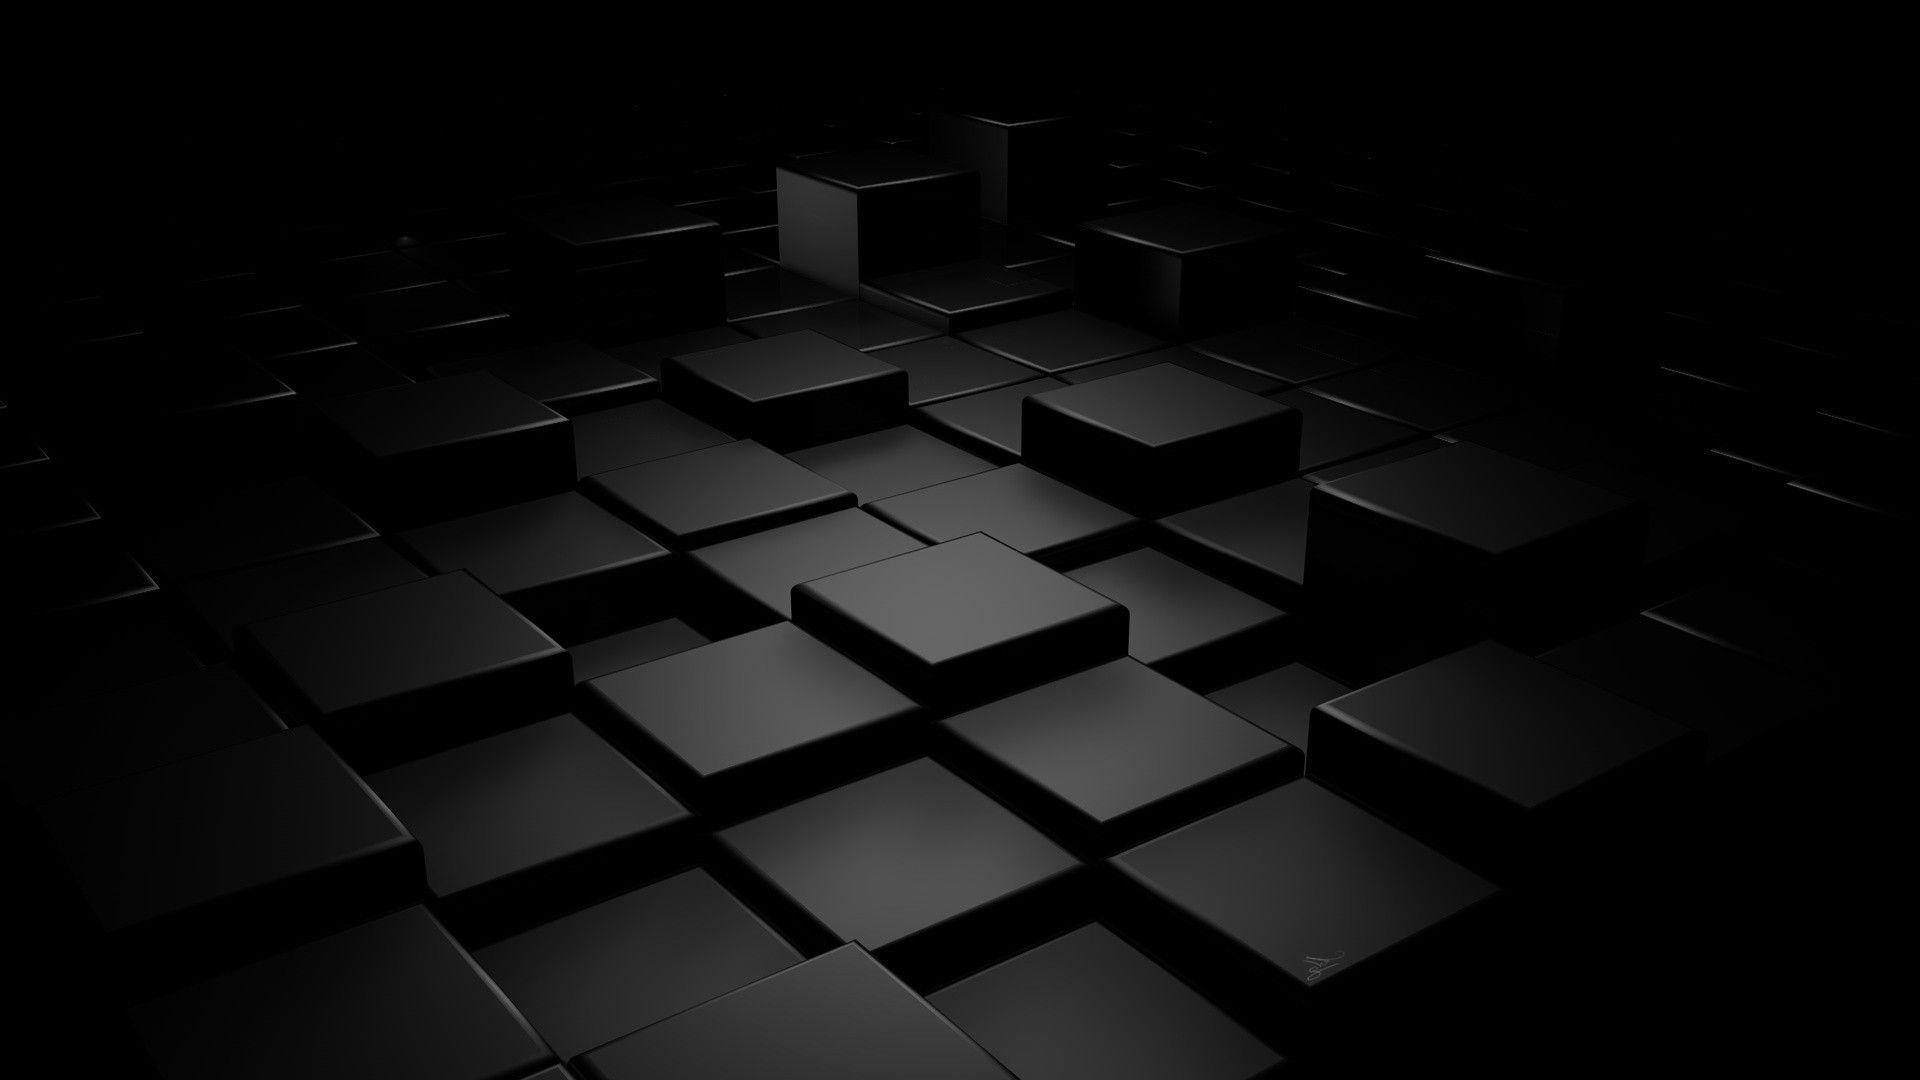 Solid Black Wallpapers Wallpaper Cave